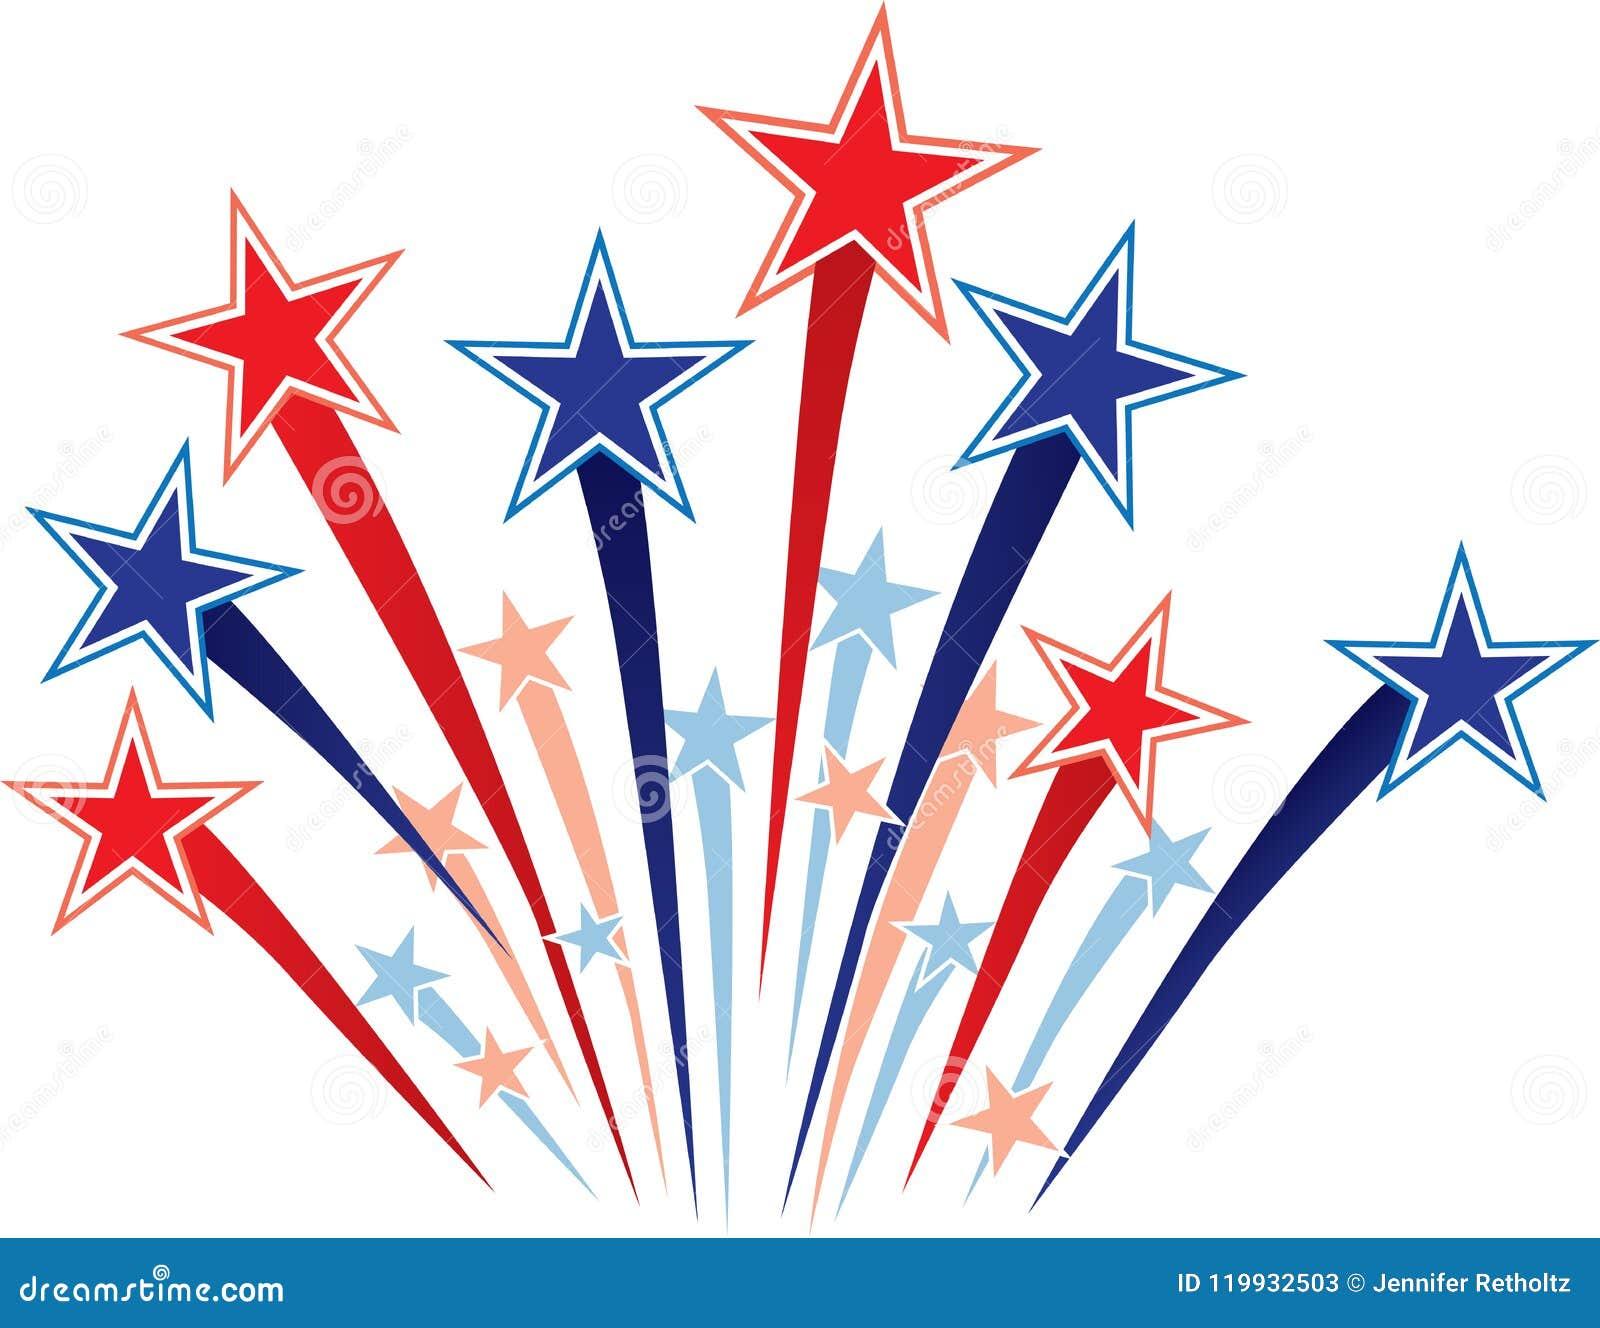 Red White and Blue Stars stock illustration. Illustration of logo ... 9bf9be107f64